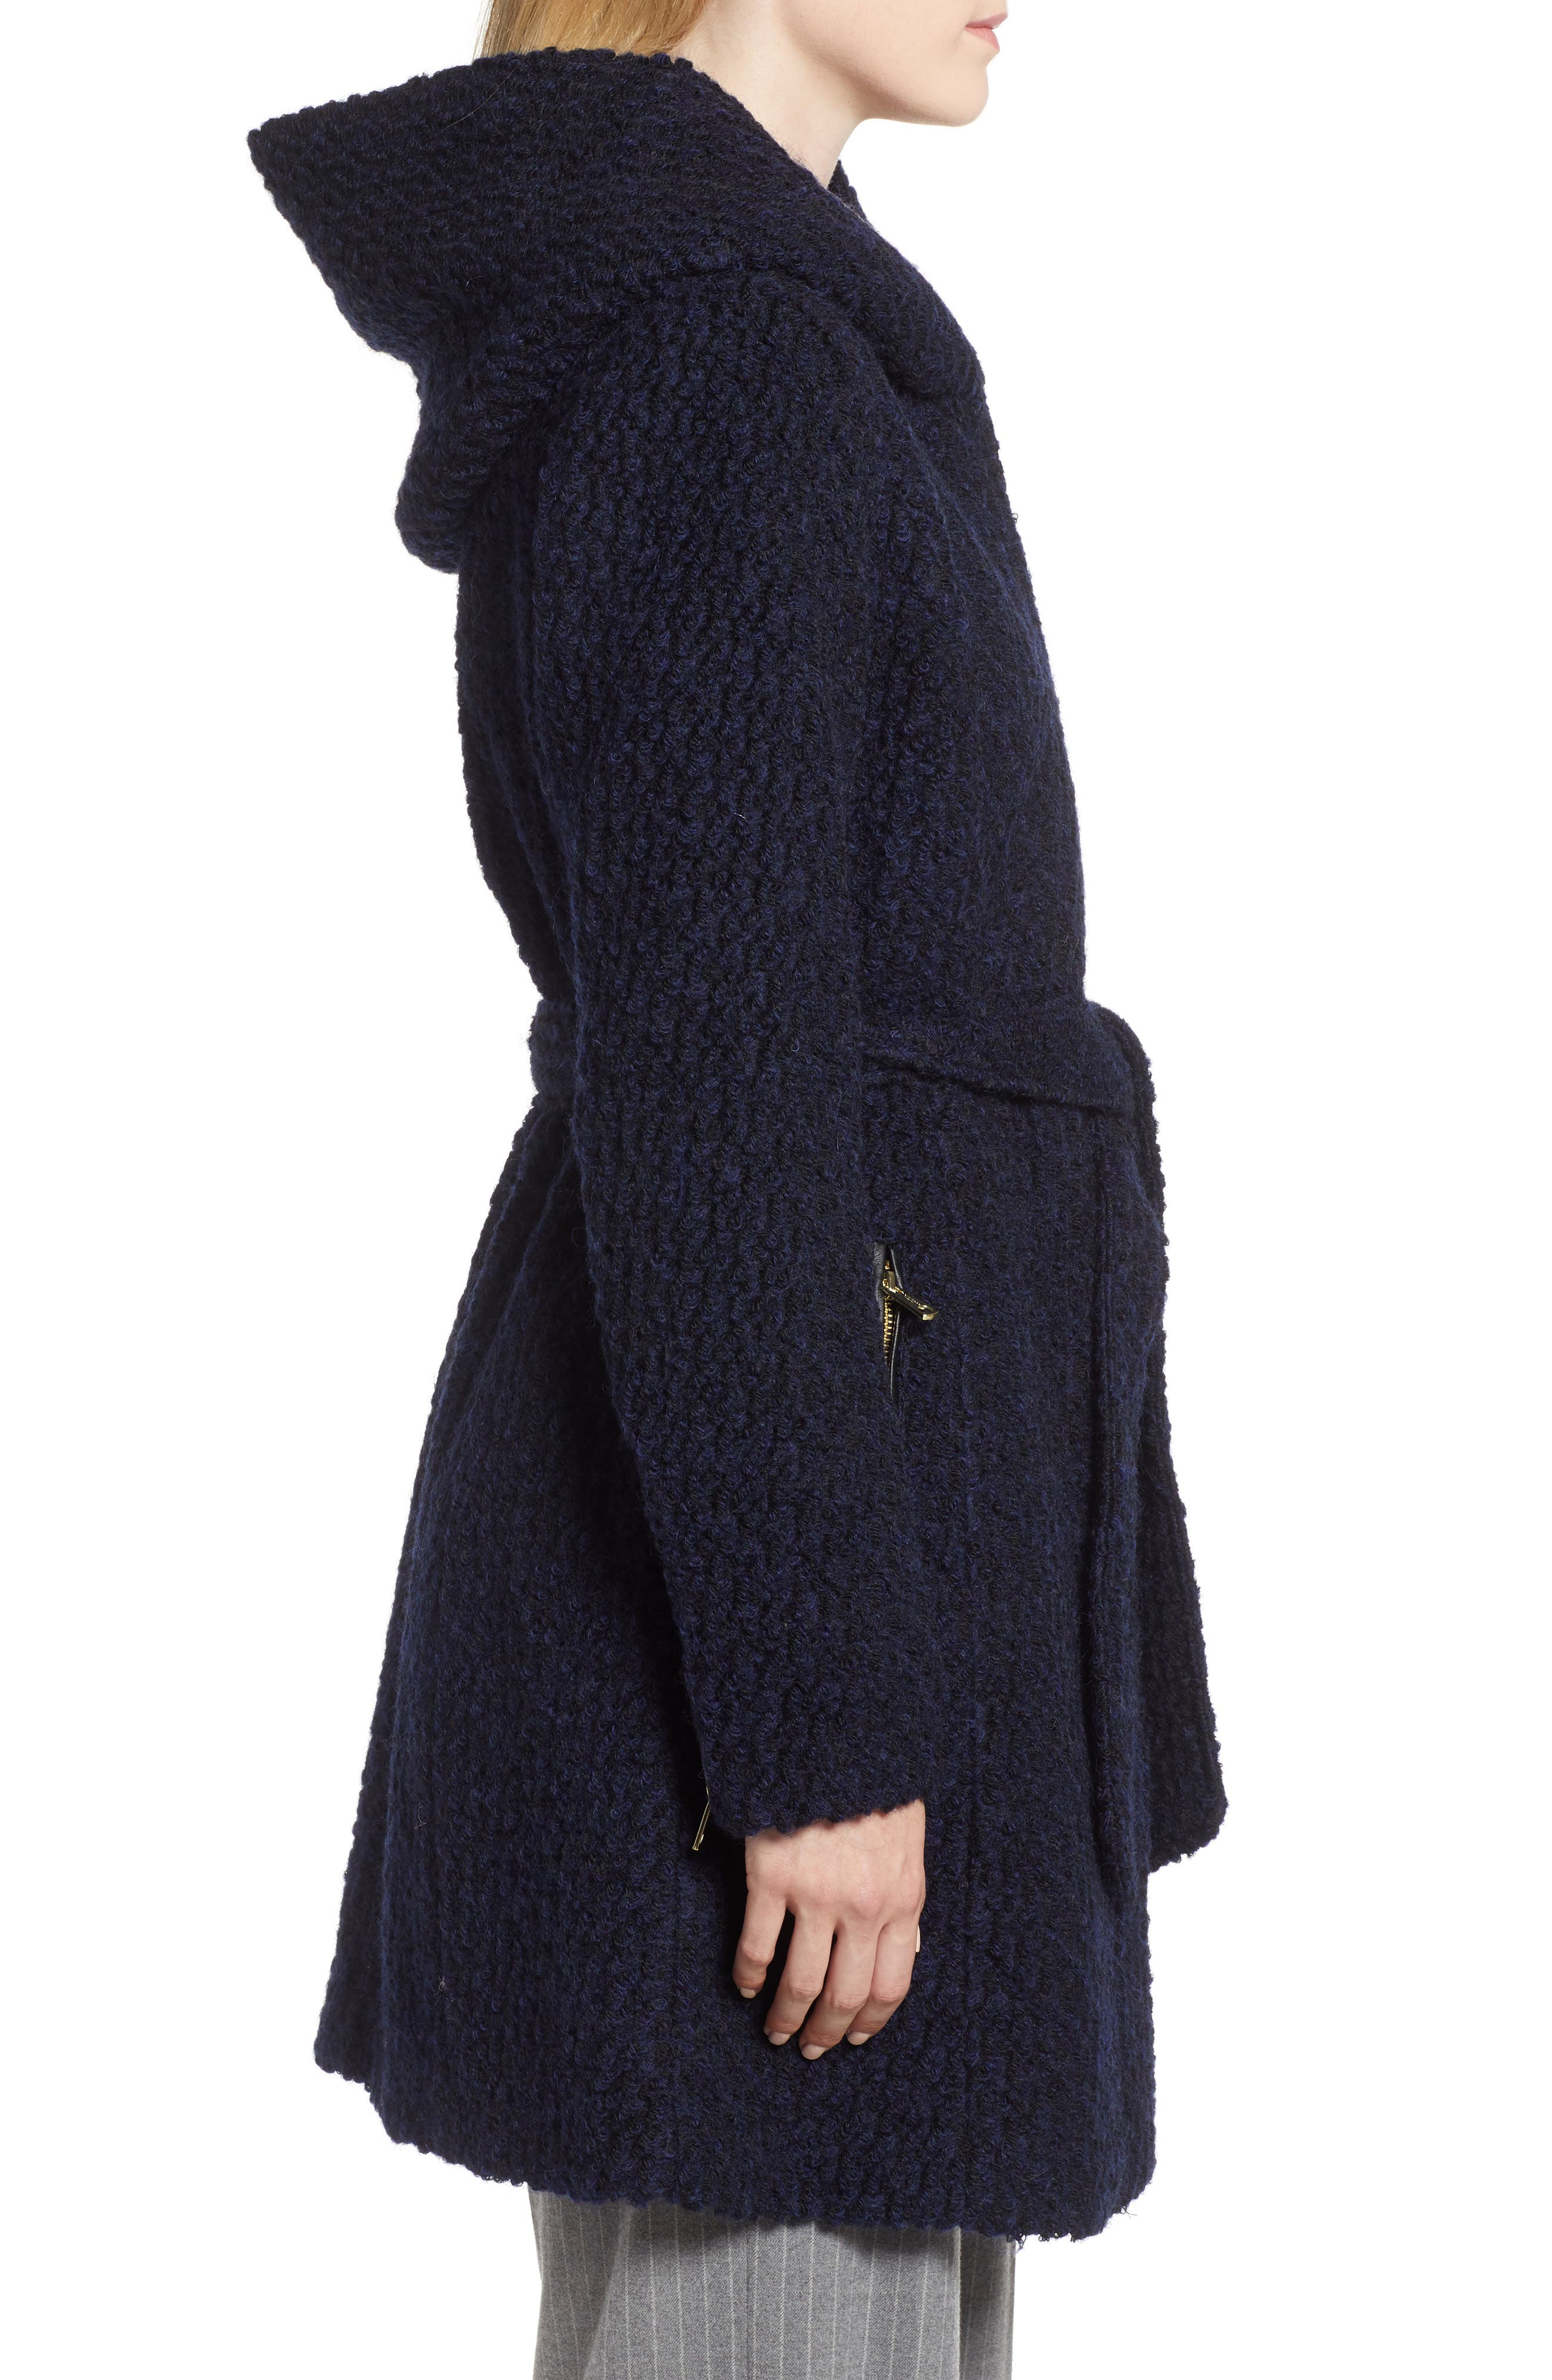 Belted Bouclé Wool Blend Coat,                             Alternate thumbnail 3, color,                             BLACK/ NAVY